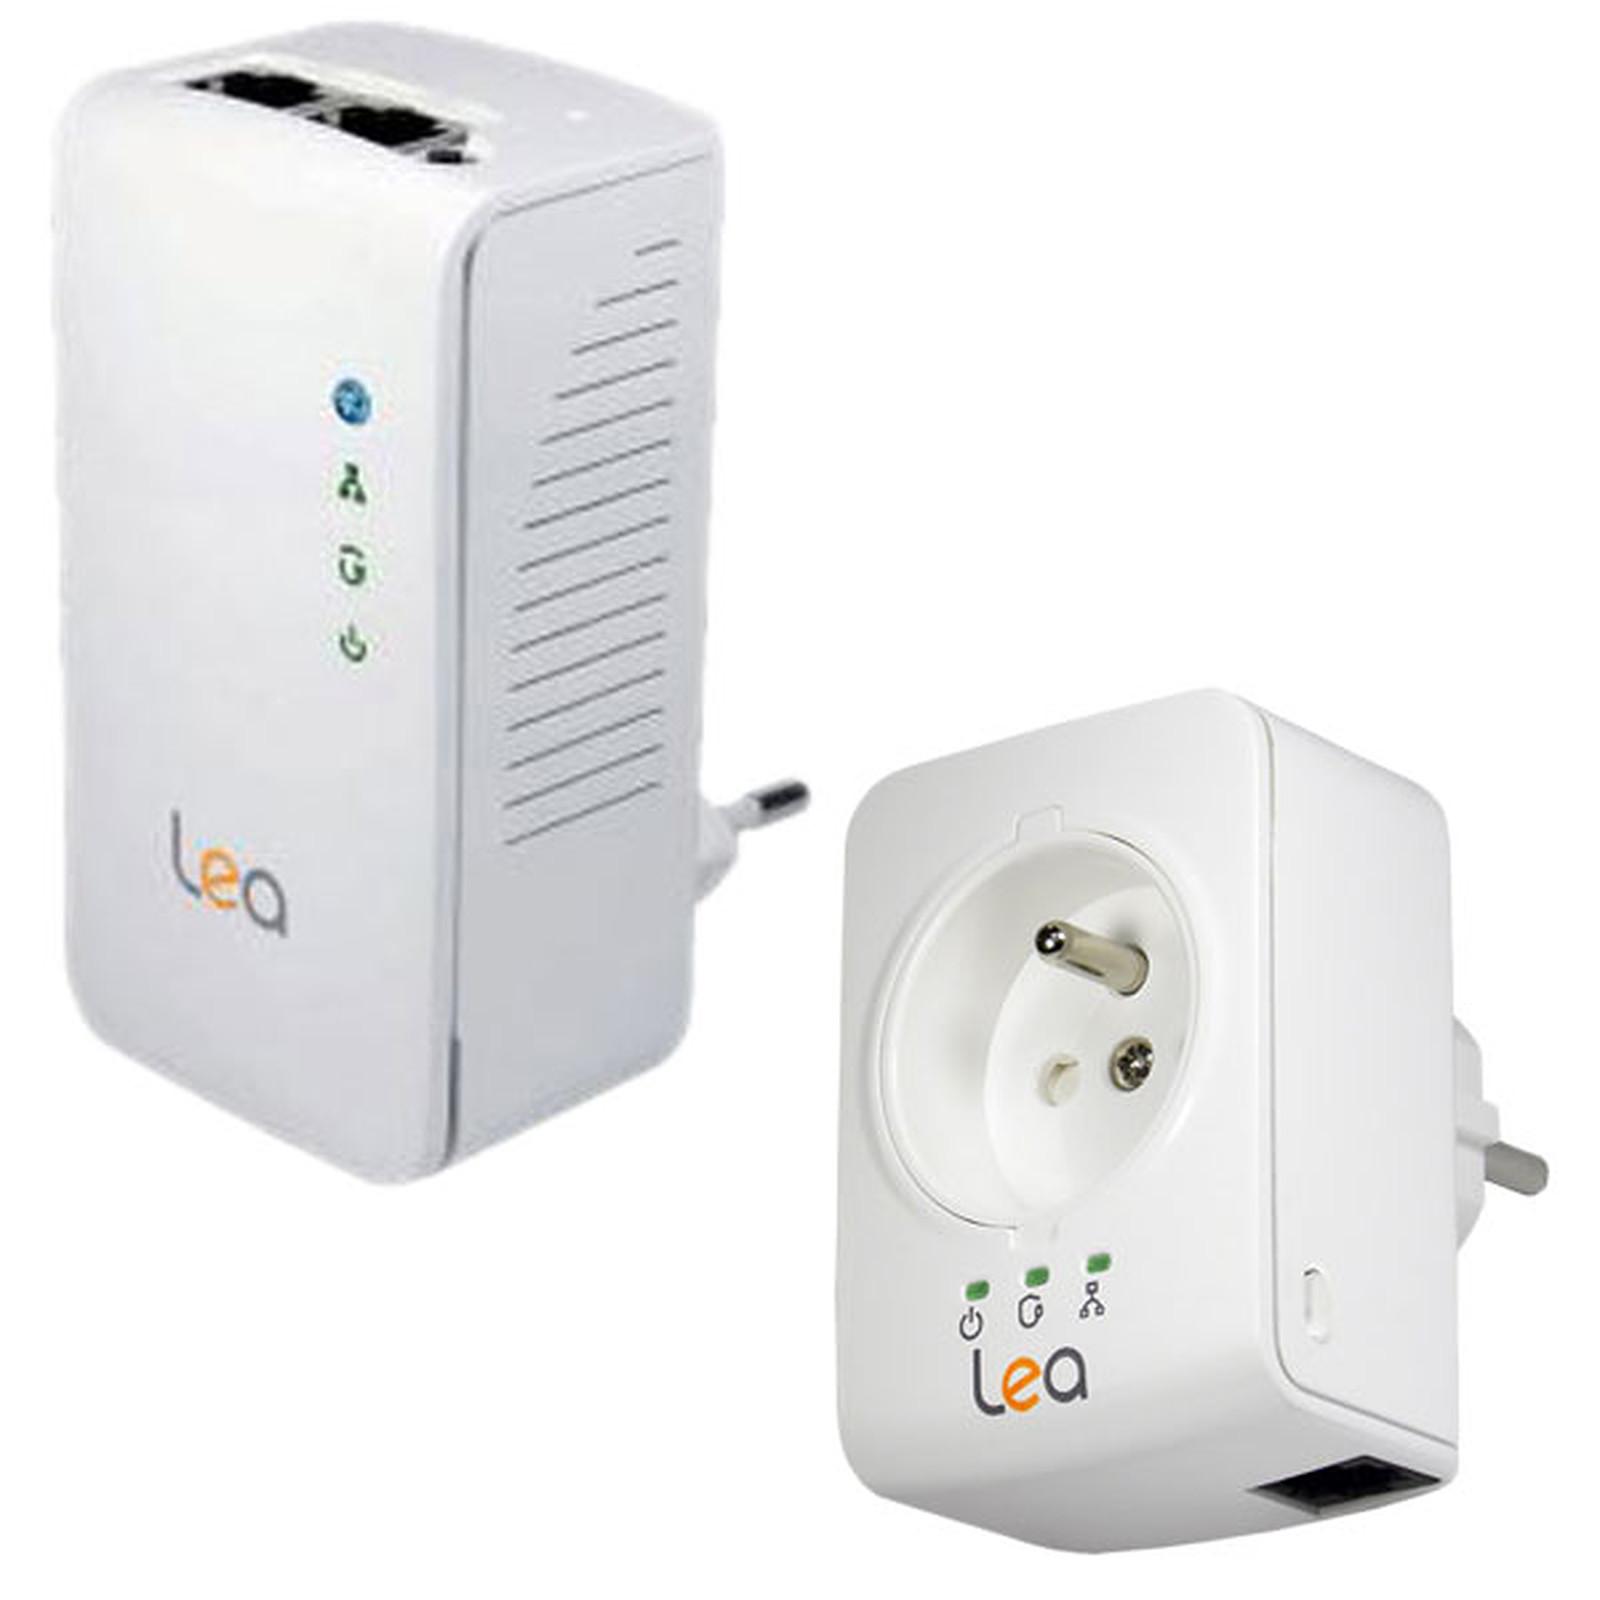 Lea NetPlug 500 Wireless N + NetSocket 500 Mini